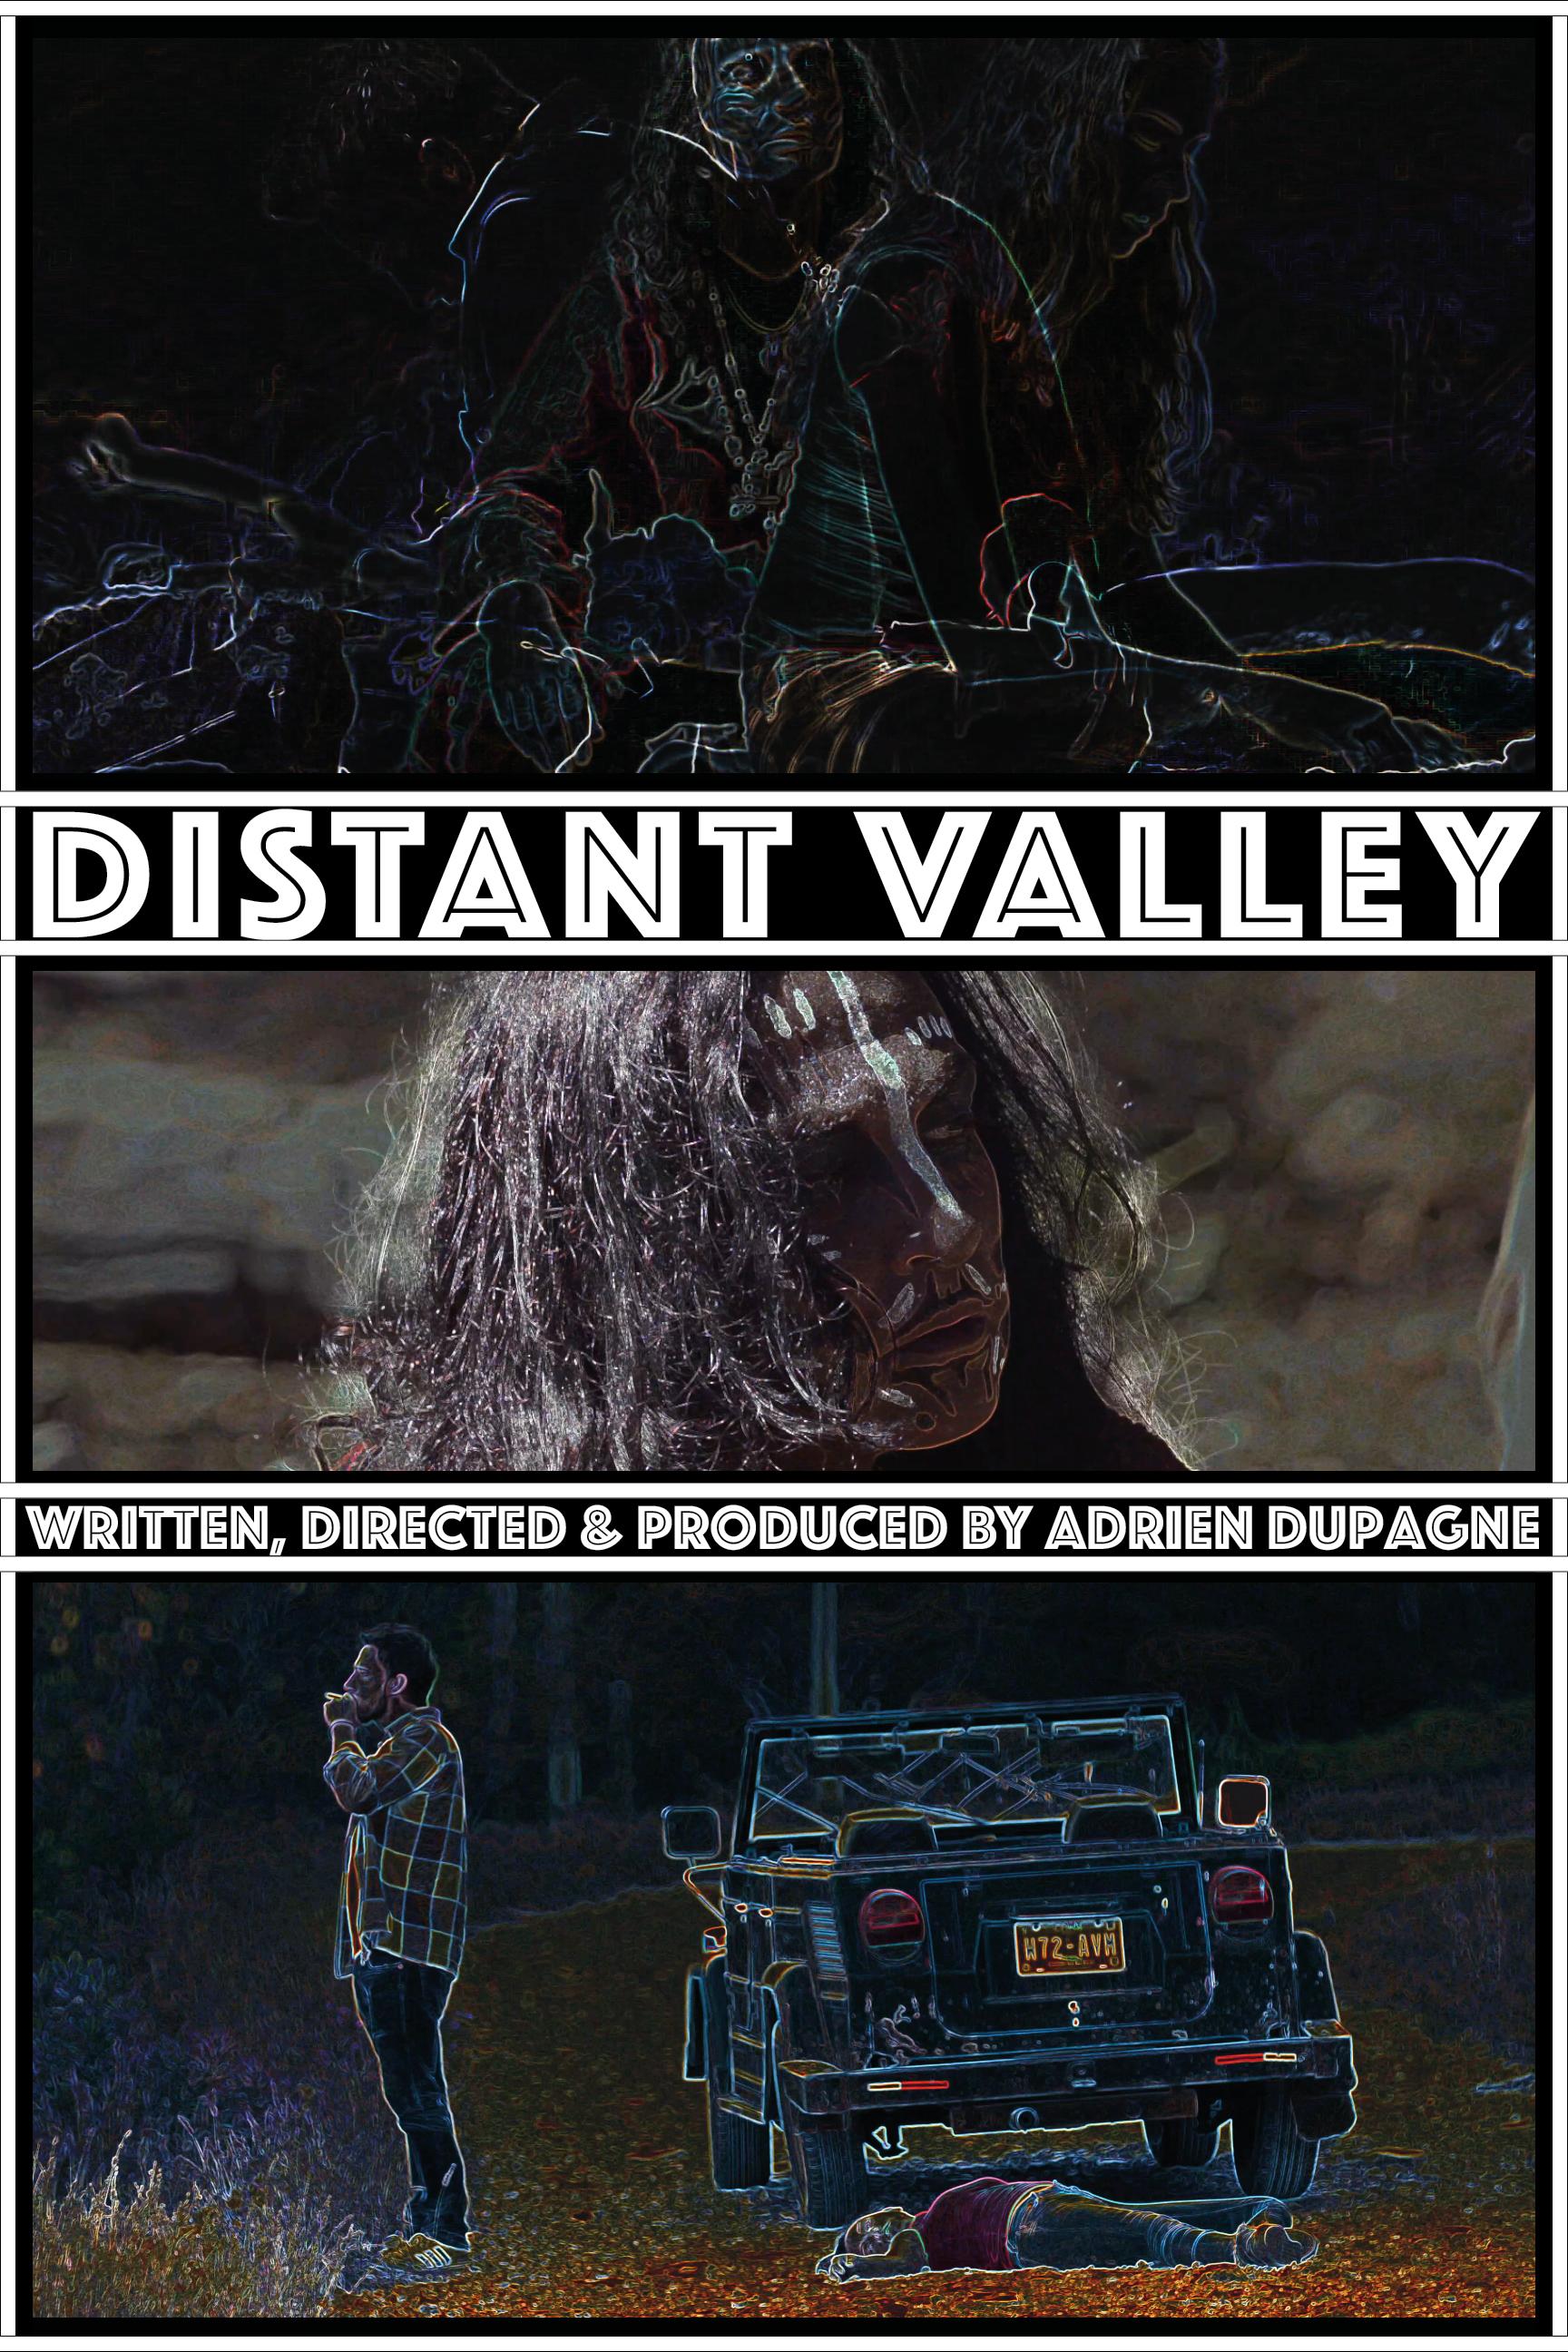 Distant Valley (2019)